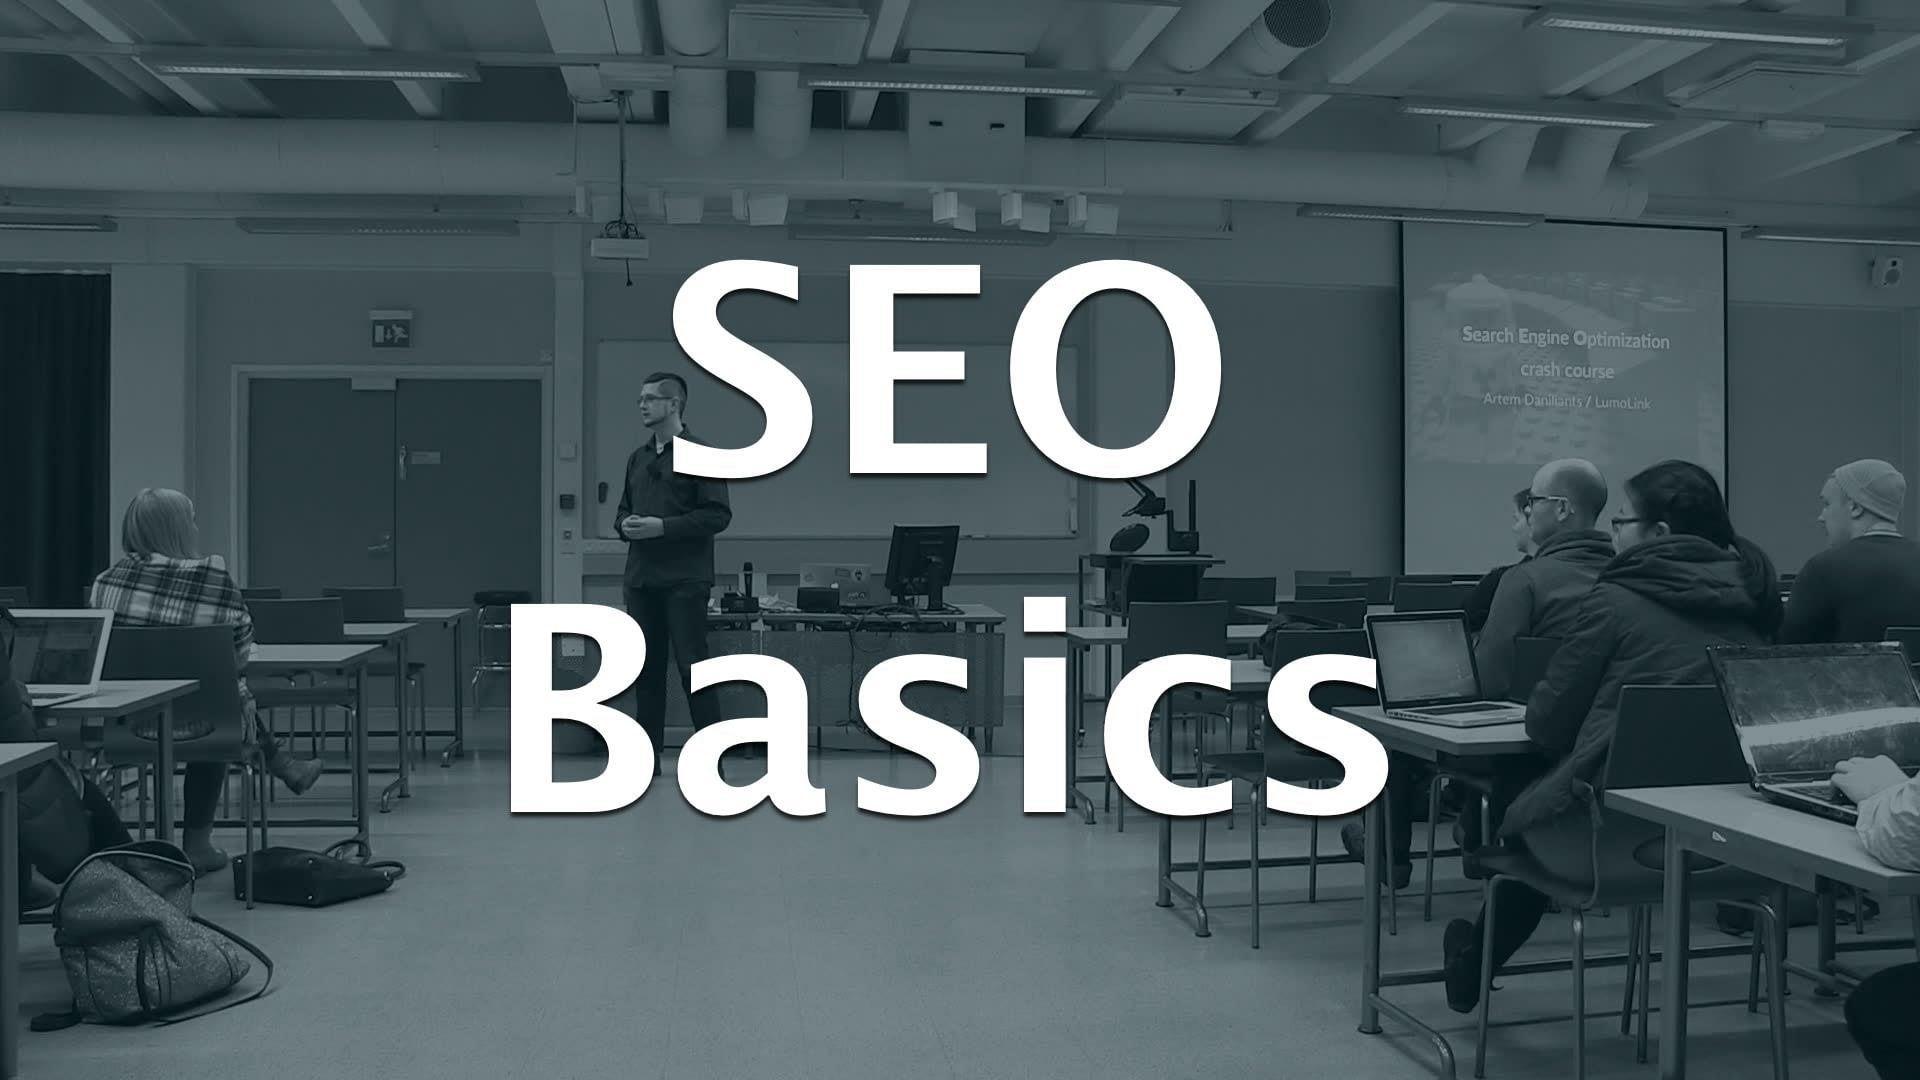 A Very Basic Search Engine Optimisation Crash Course